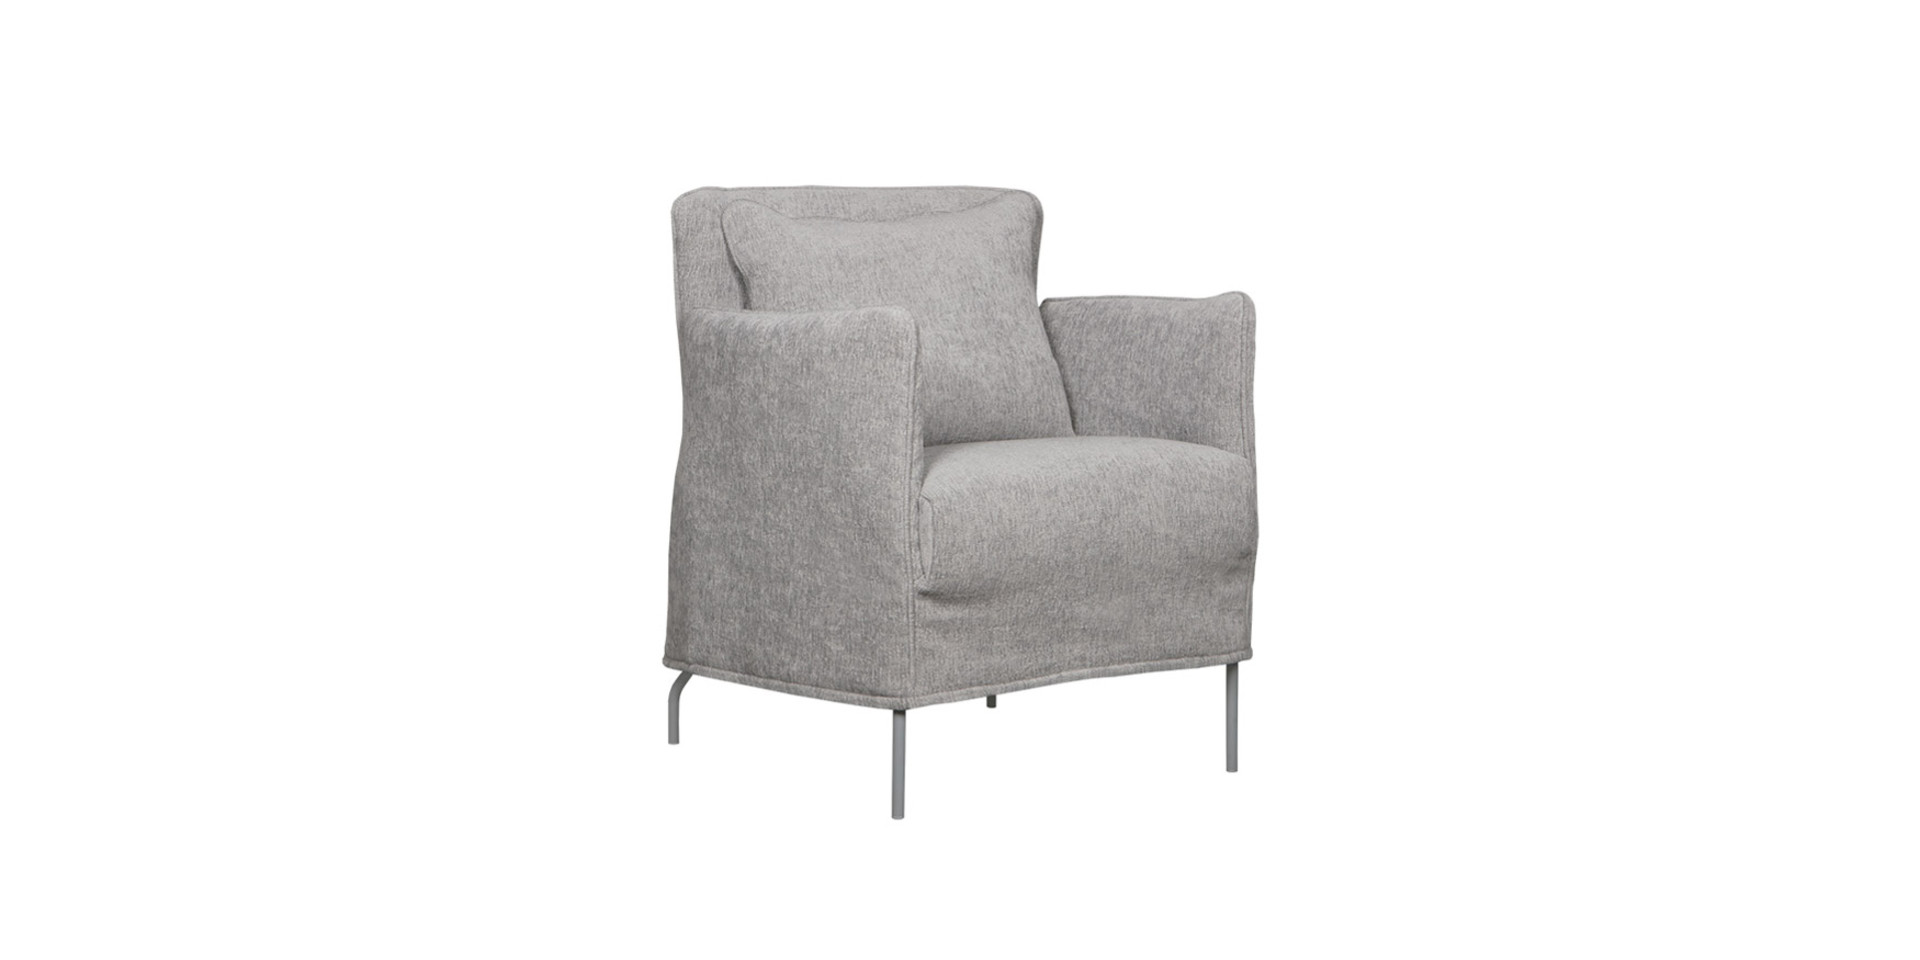 2CUTE_armchair_dion12_light_grey_2